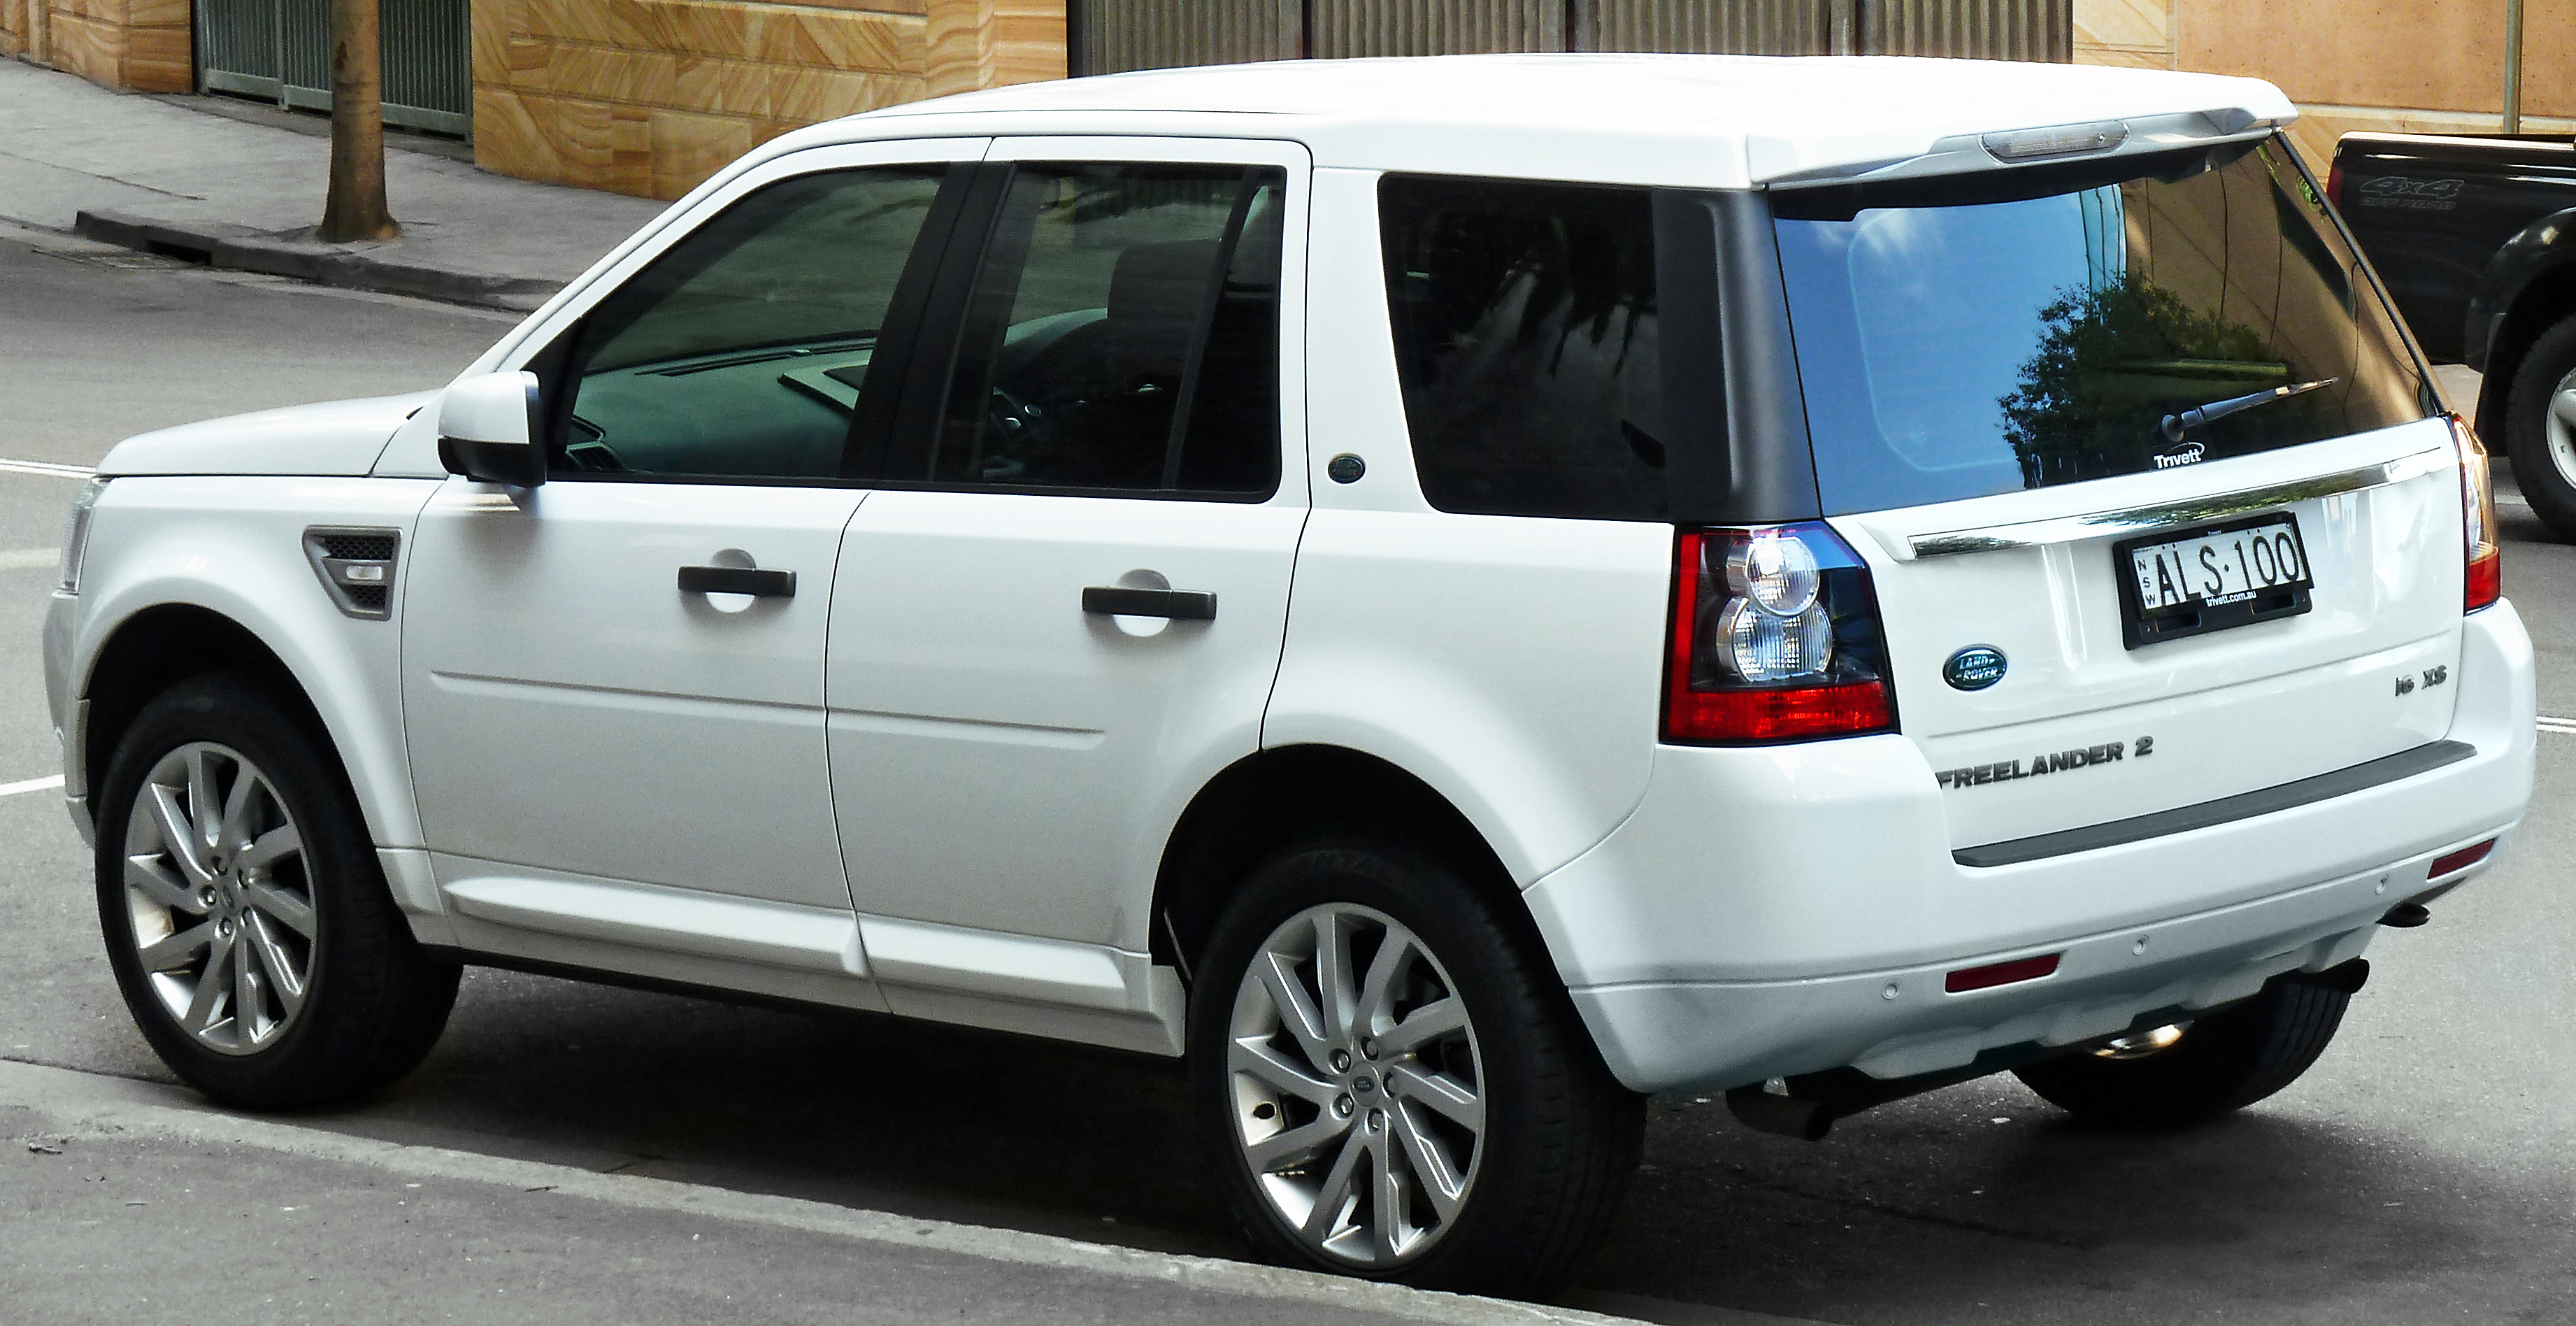 file 2010 2011 land rover freelander 2 lf xs si6 wagon 2011 10 31. Black Bedroom Furniture Sets. Home Design Ideas